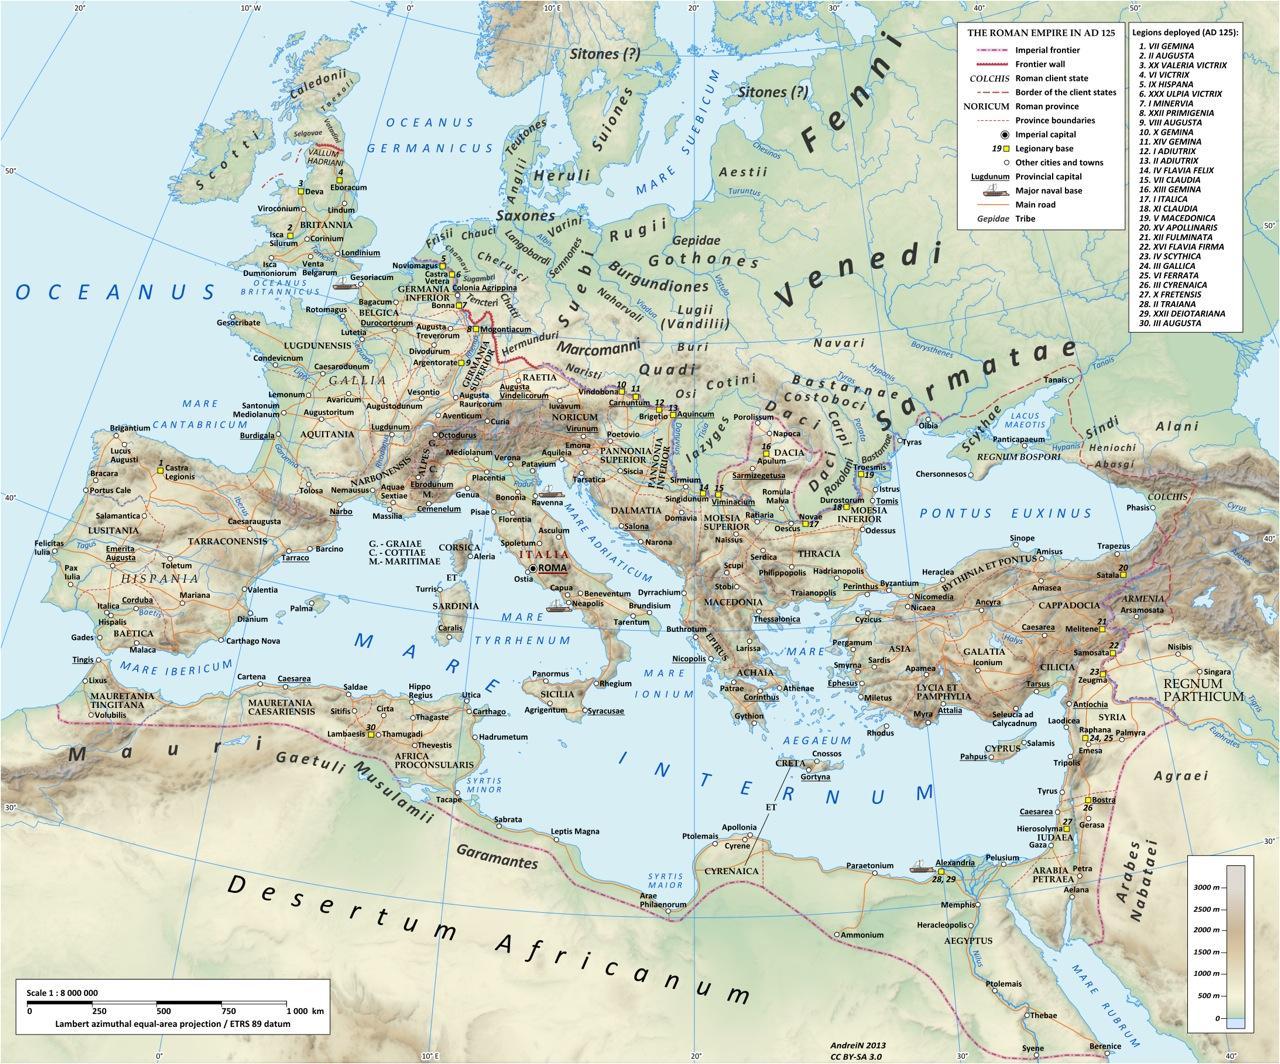 Petra 1-mapa romano